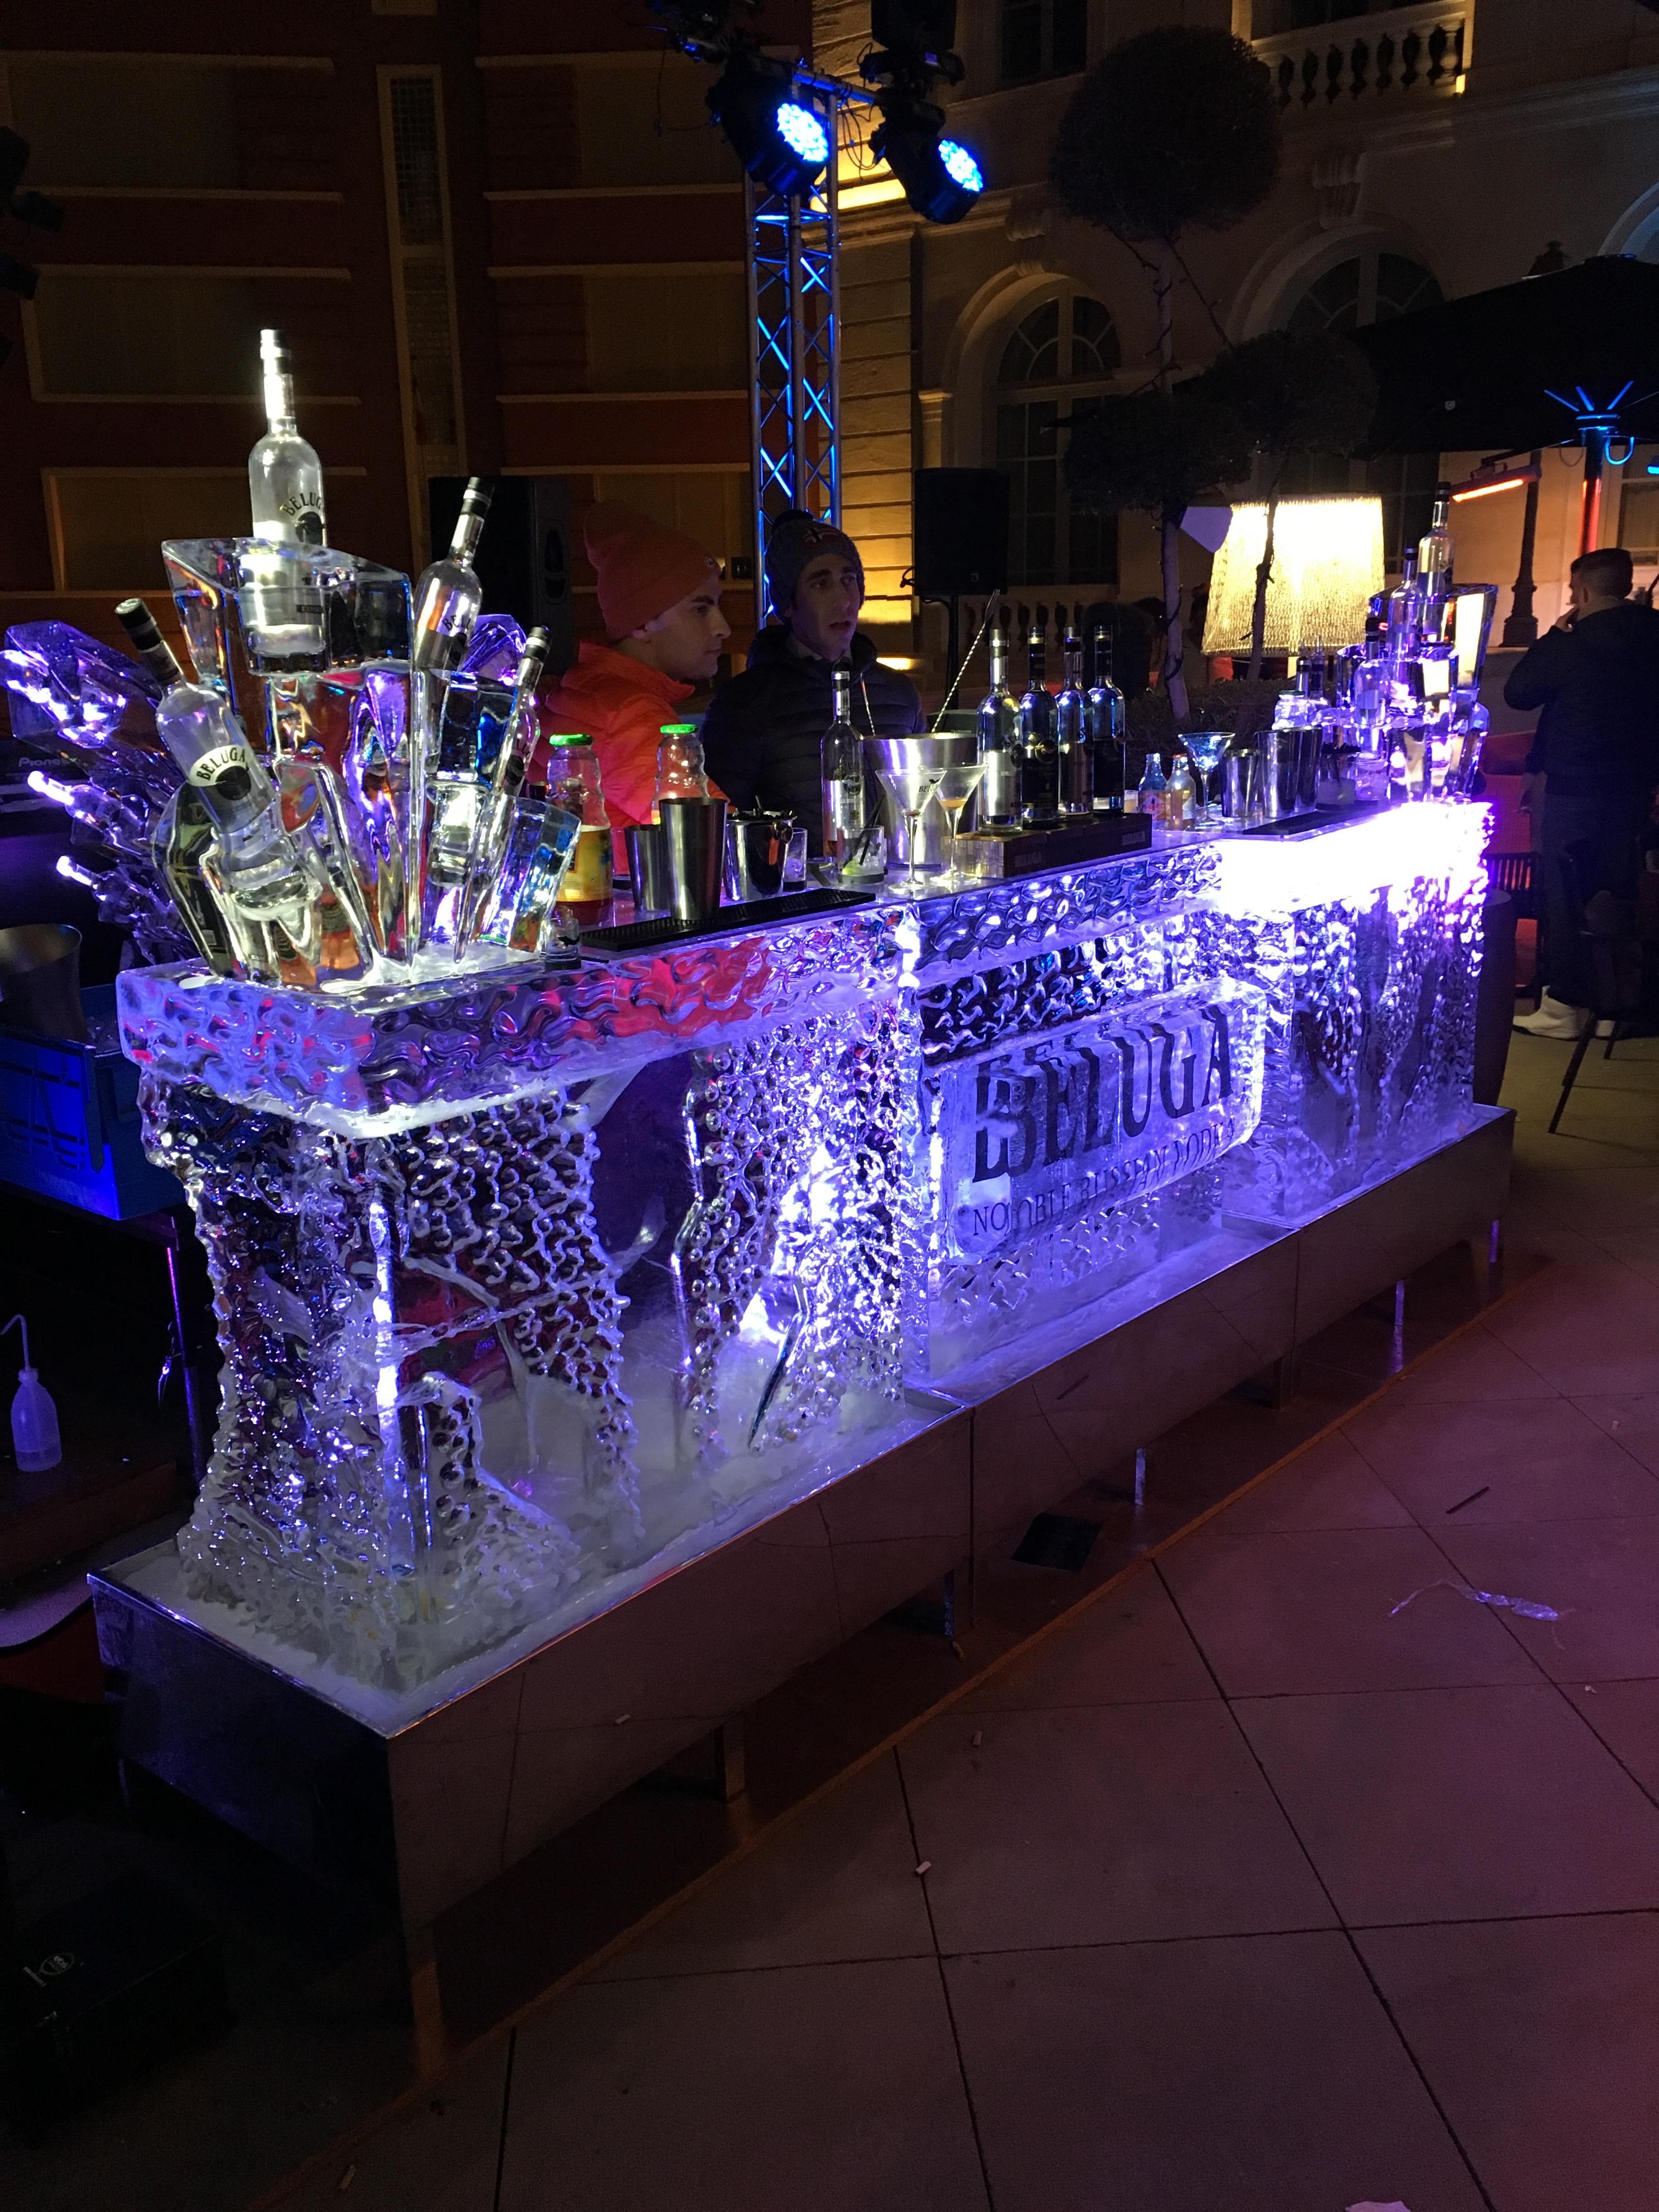 Ice Bar, Bar en glace, bar, sculpture sur glace France